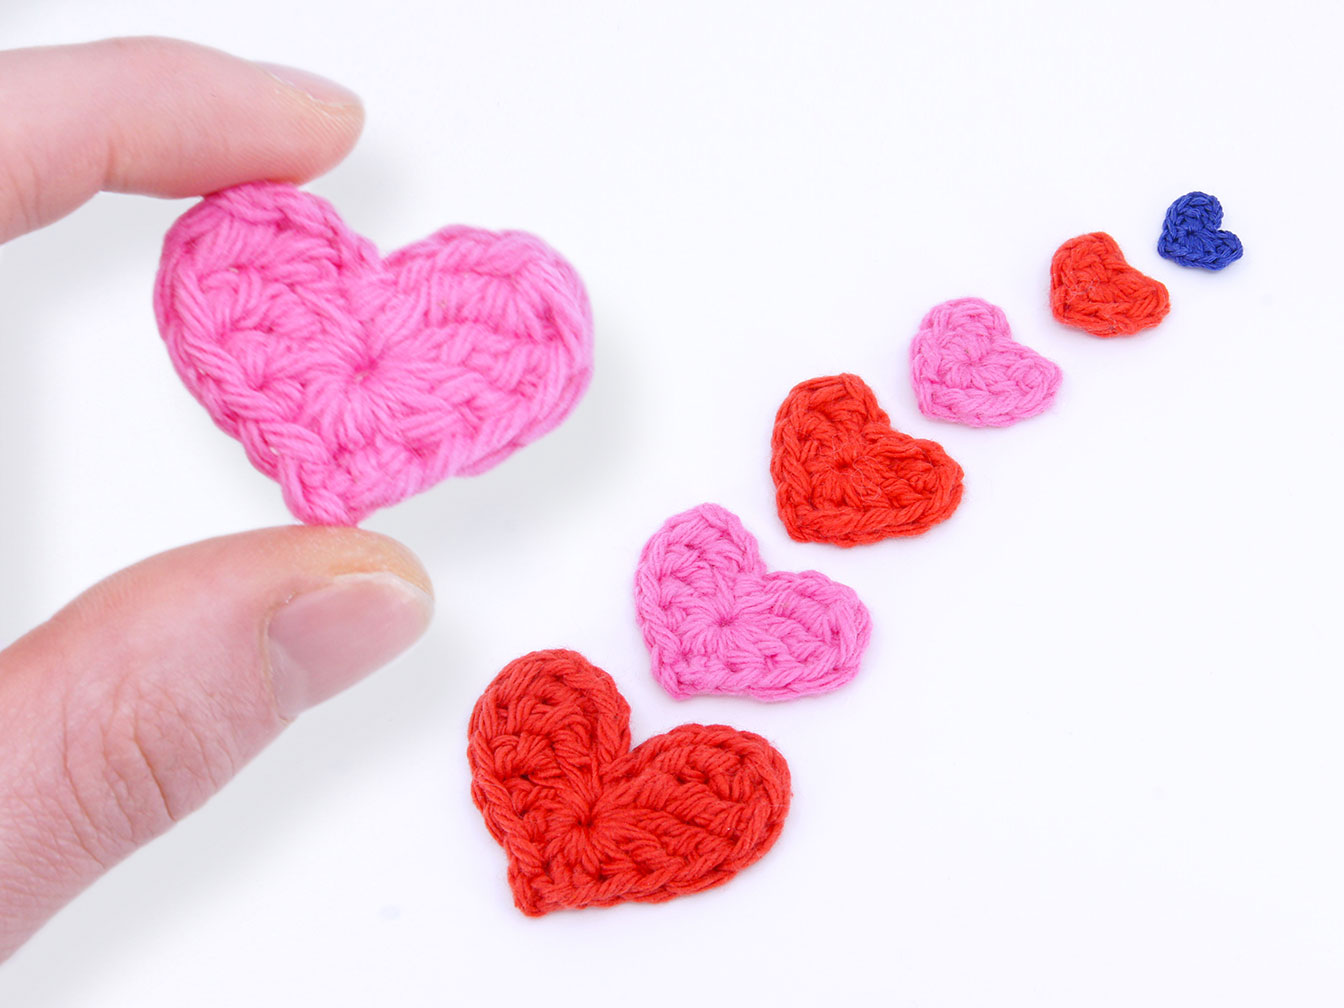 Miniature Flat Heart Crochet Pattern